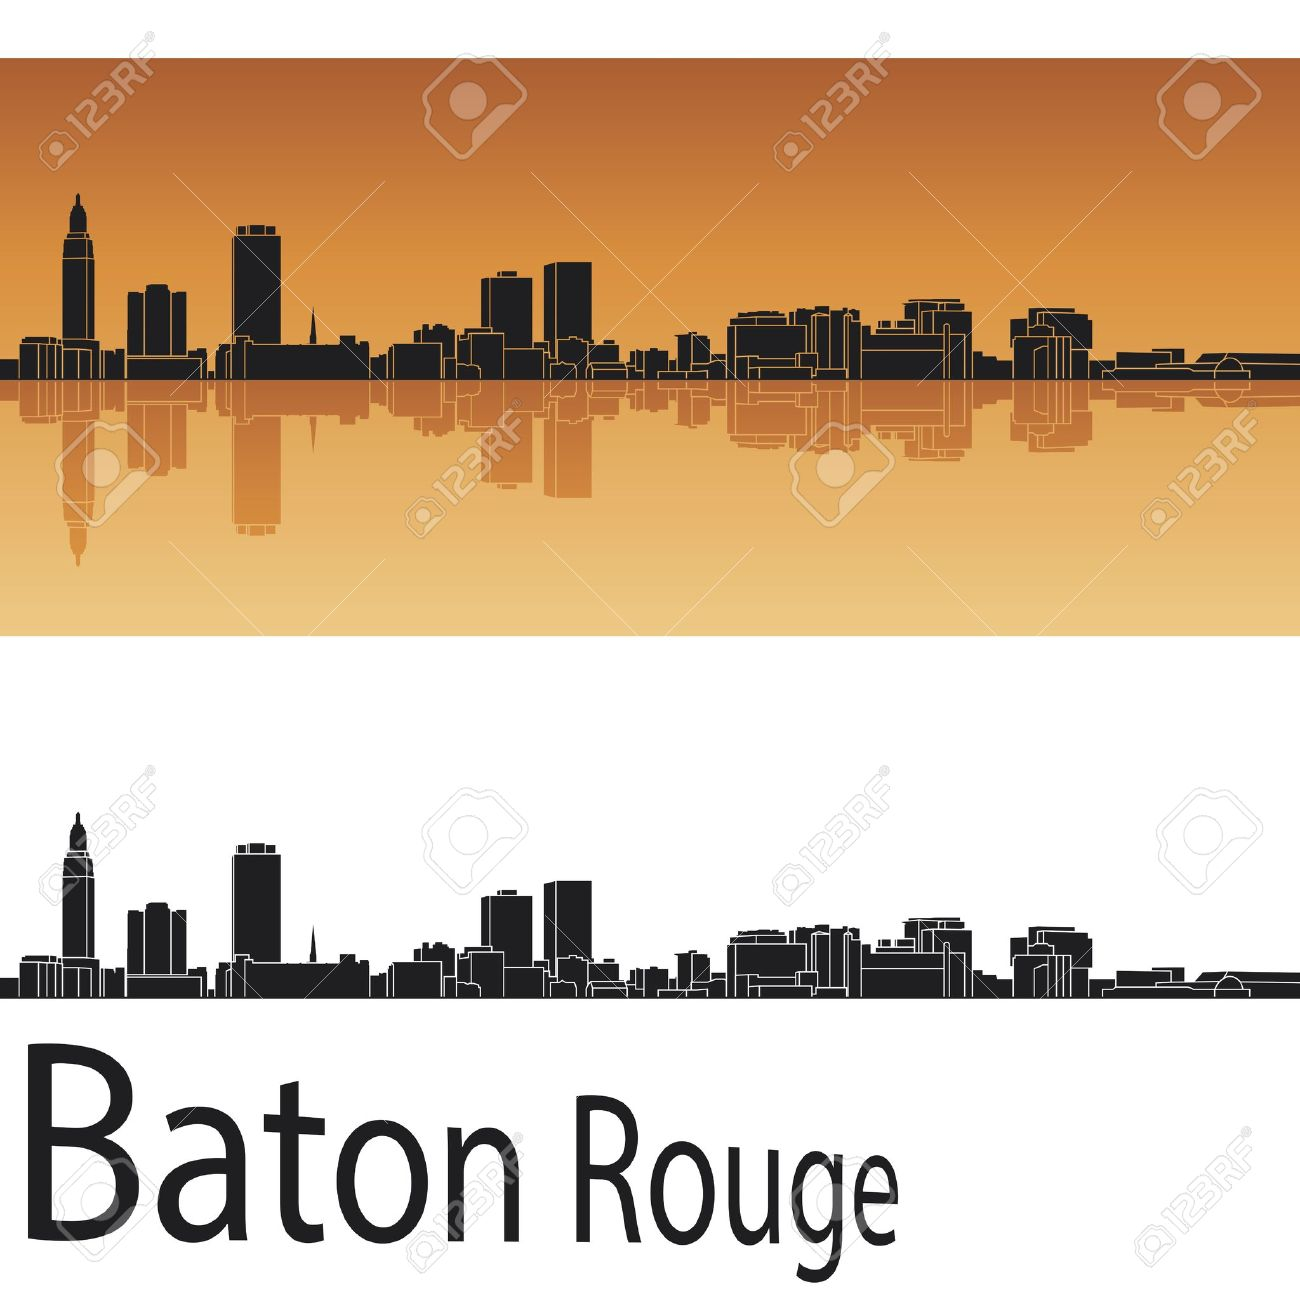 Baton Rouge skyline in orange background in editable - 20352160